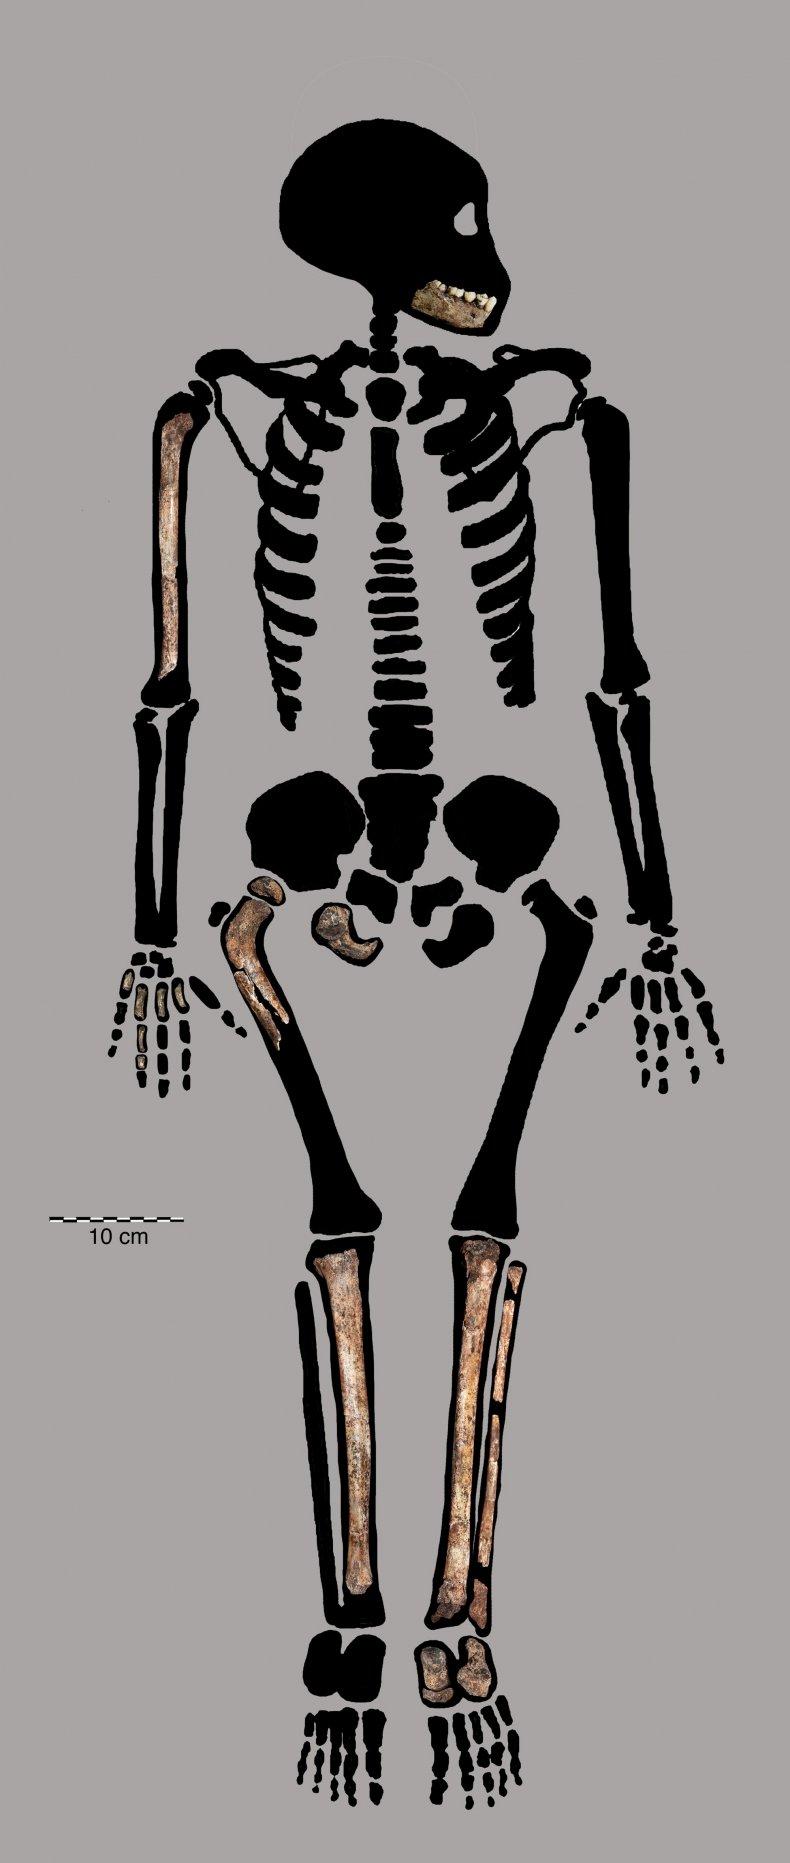 Homo naledi juvenile remains